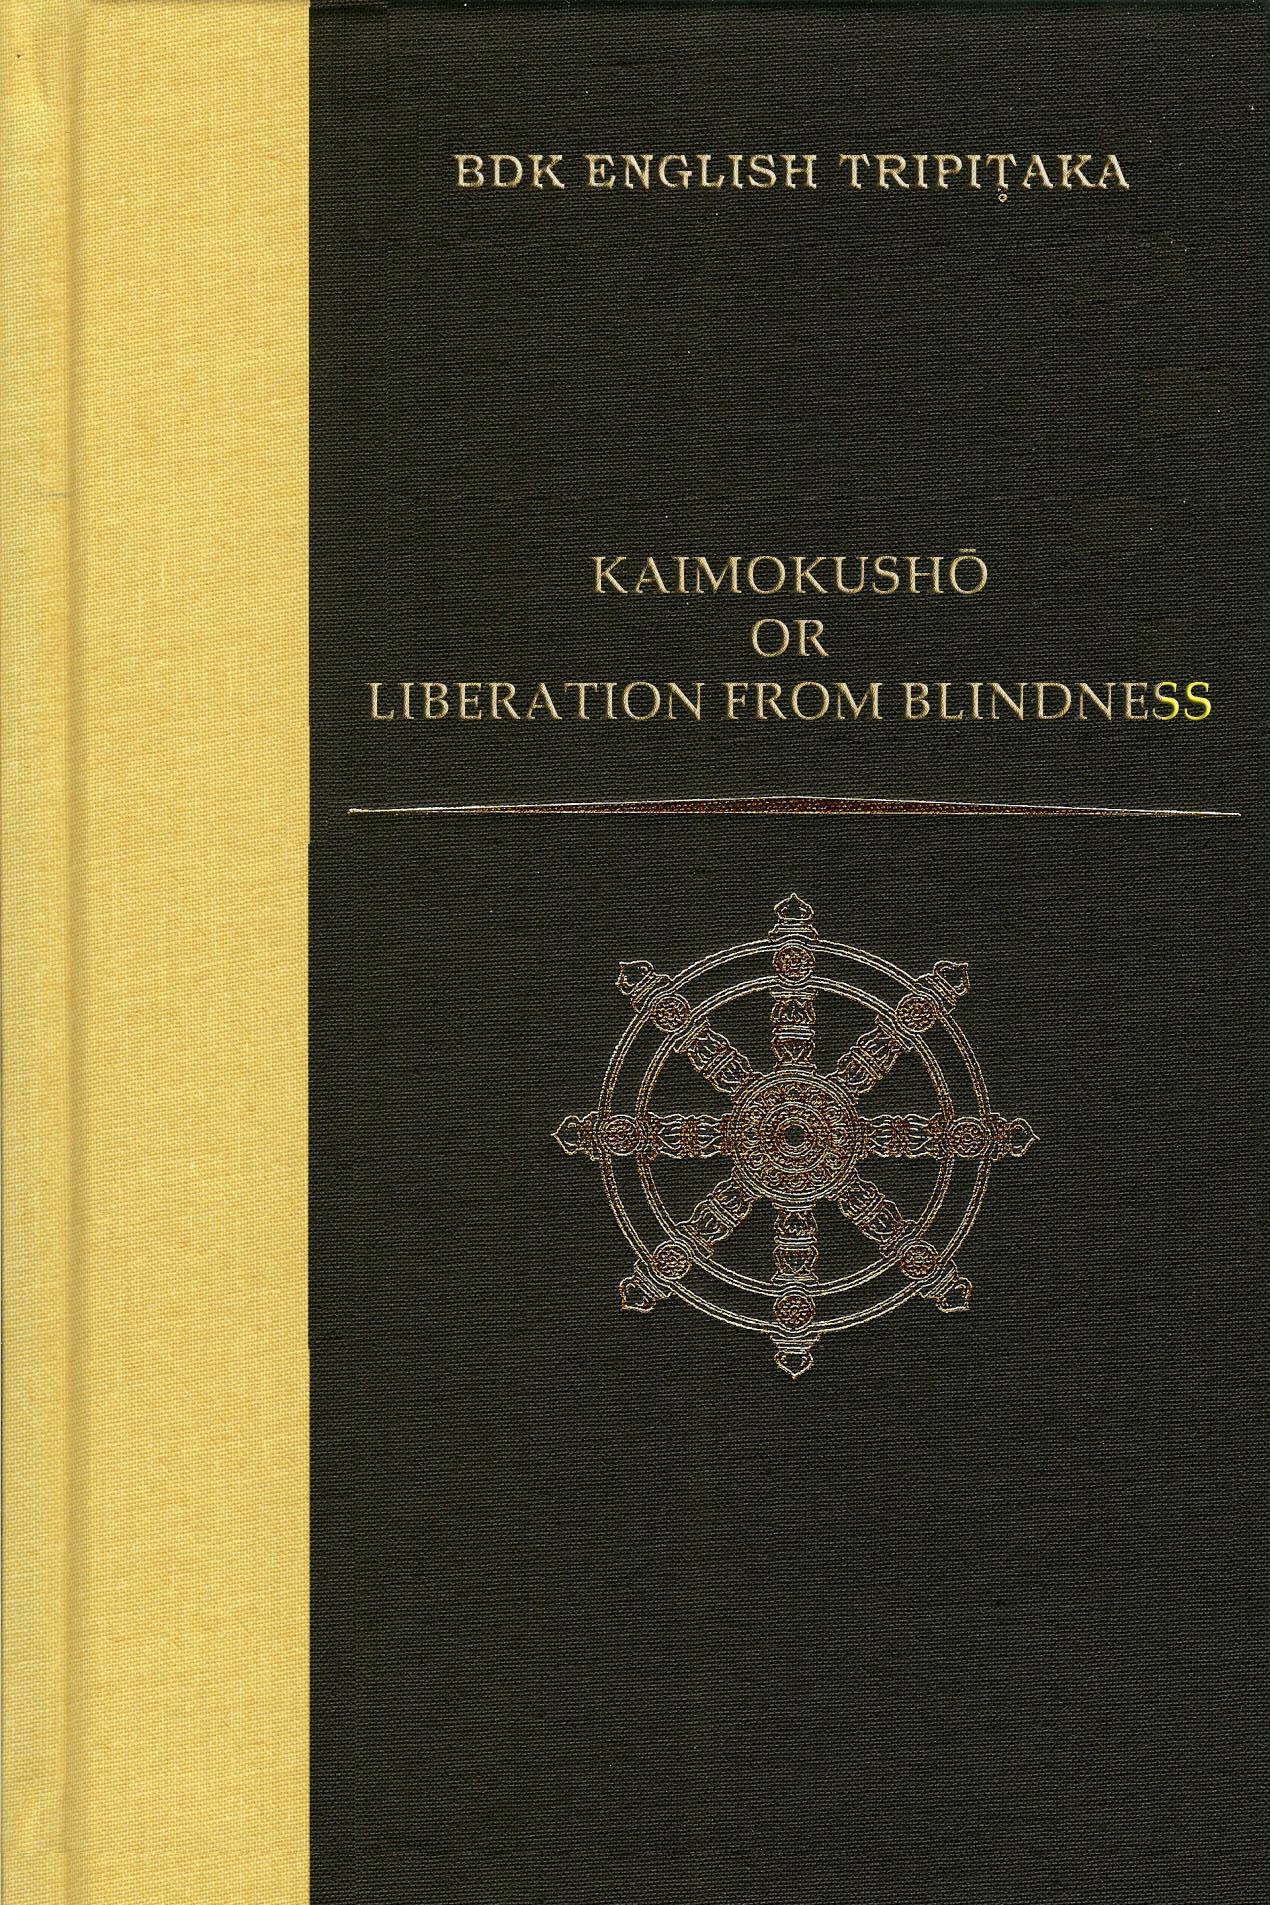 Nichiren Kaimokusho cover art